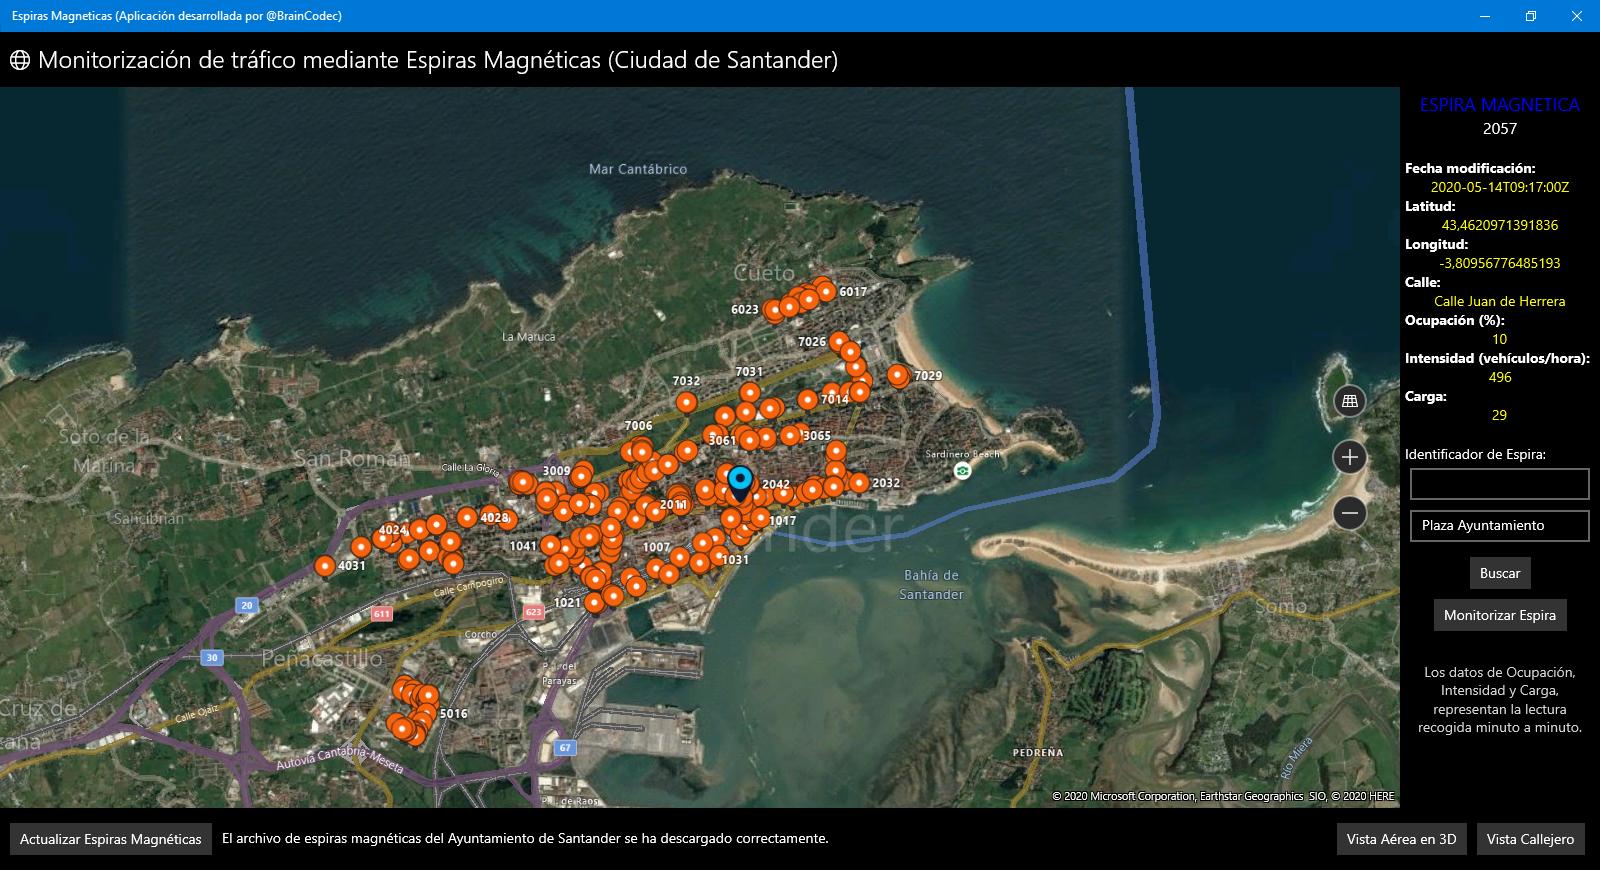 http://datos.santander.es/wp-content/uploads/2020/05/EspirasMagneticas_BrainCodec_Captura_1.png